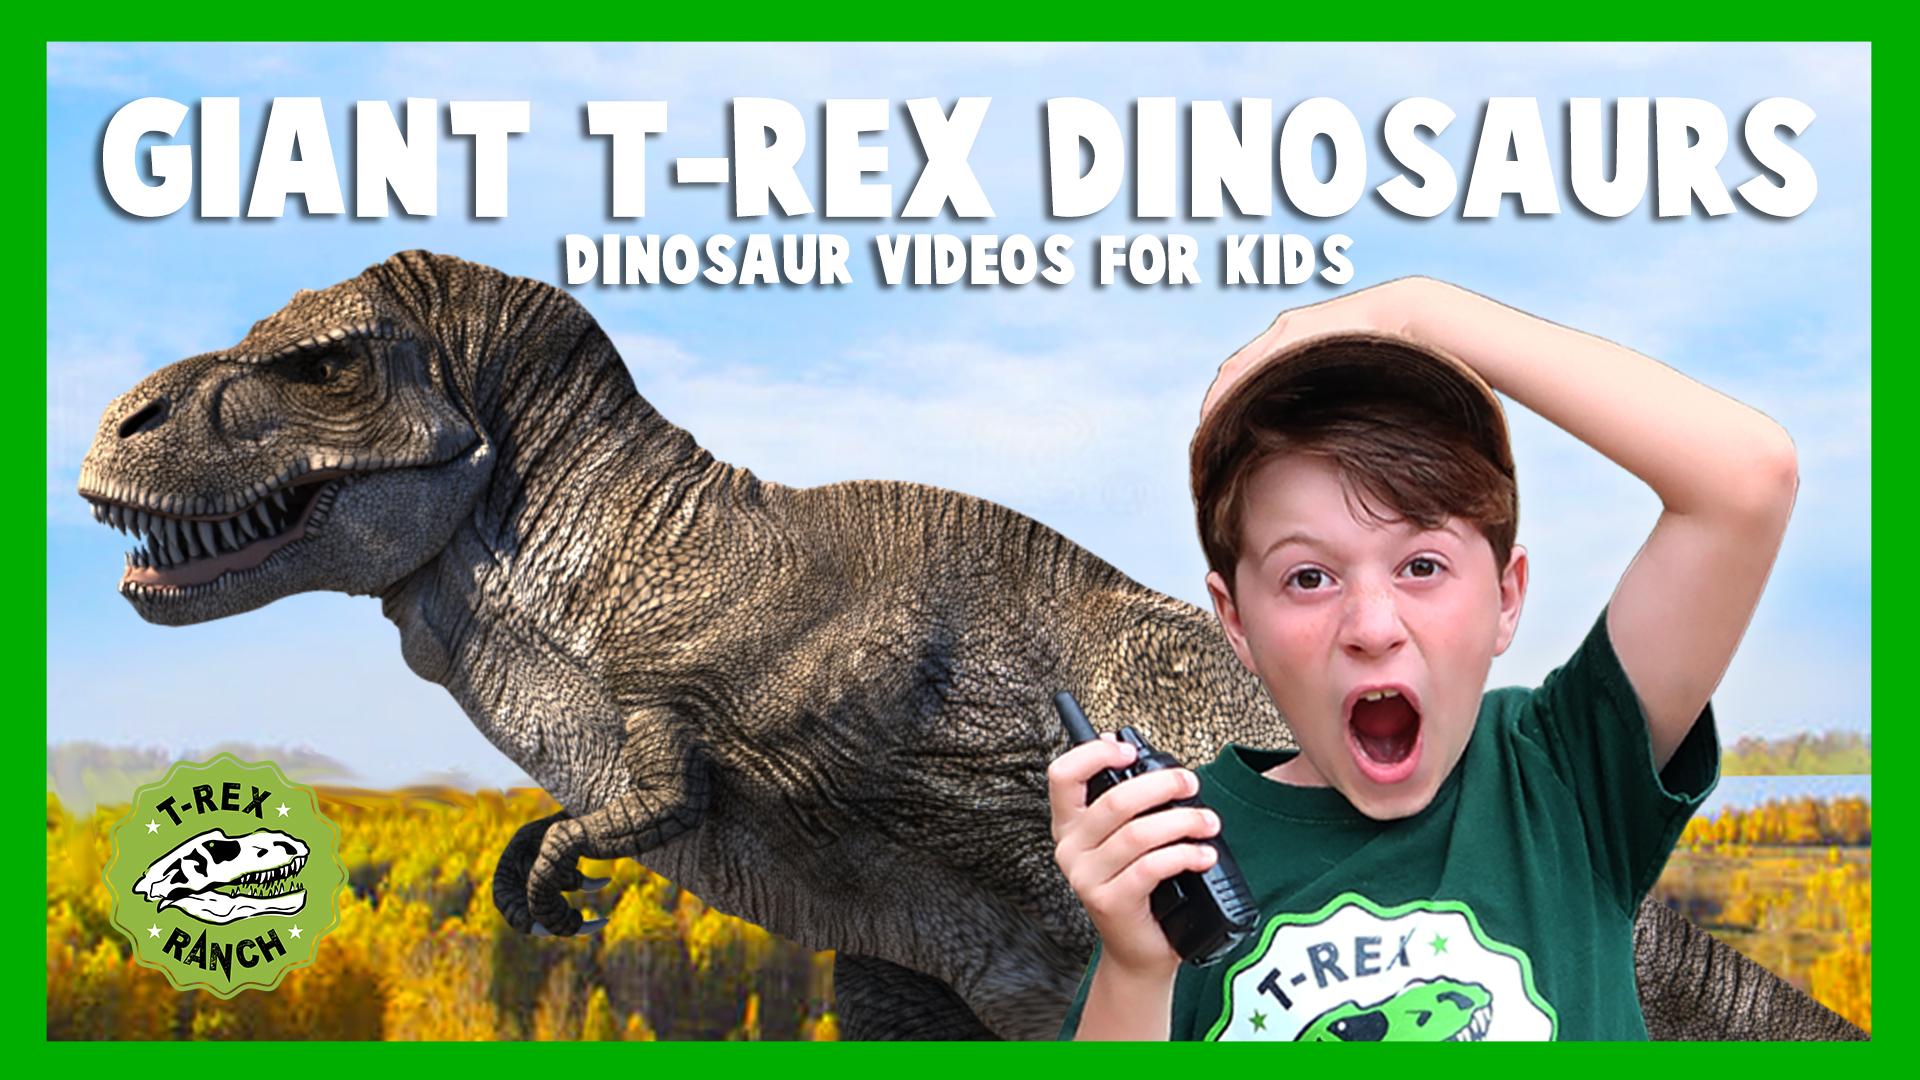 T-Rex Ranch - Giant T-Rex Dinosaurs - Dinosaur Videos for Kids